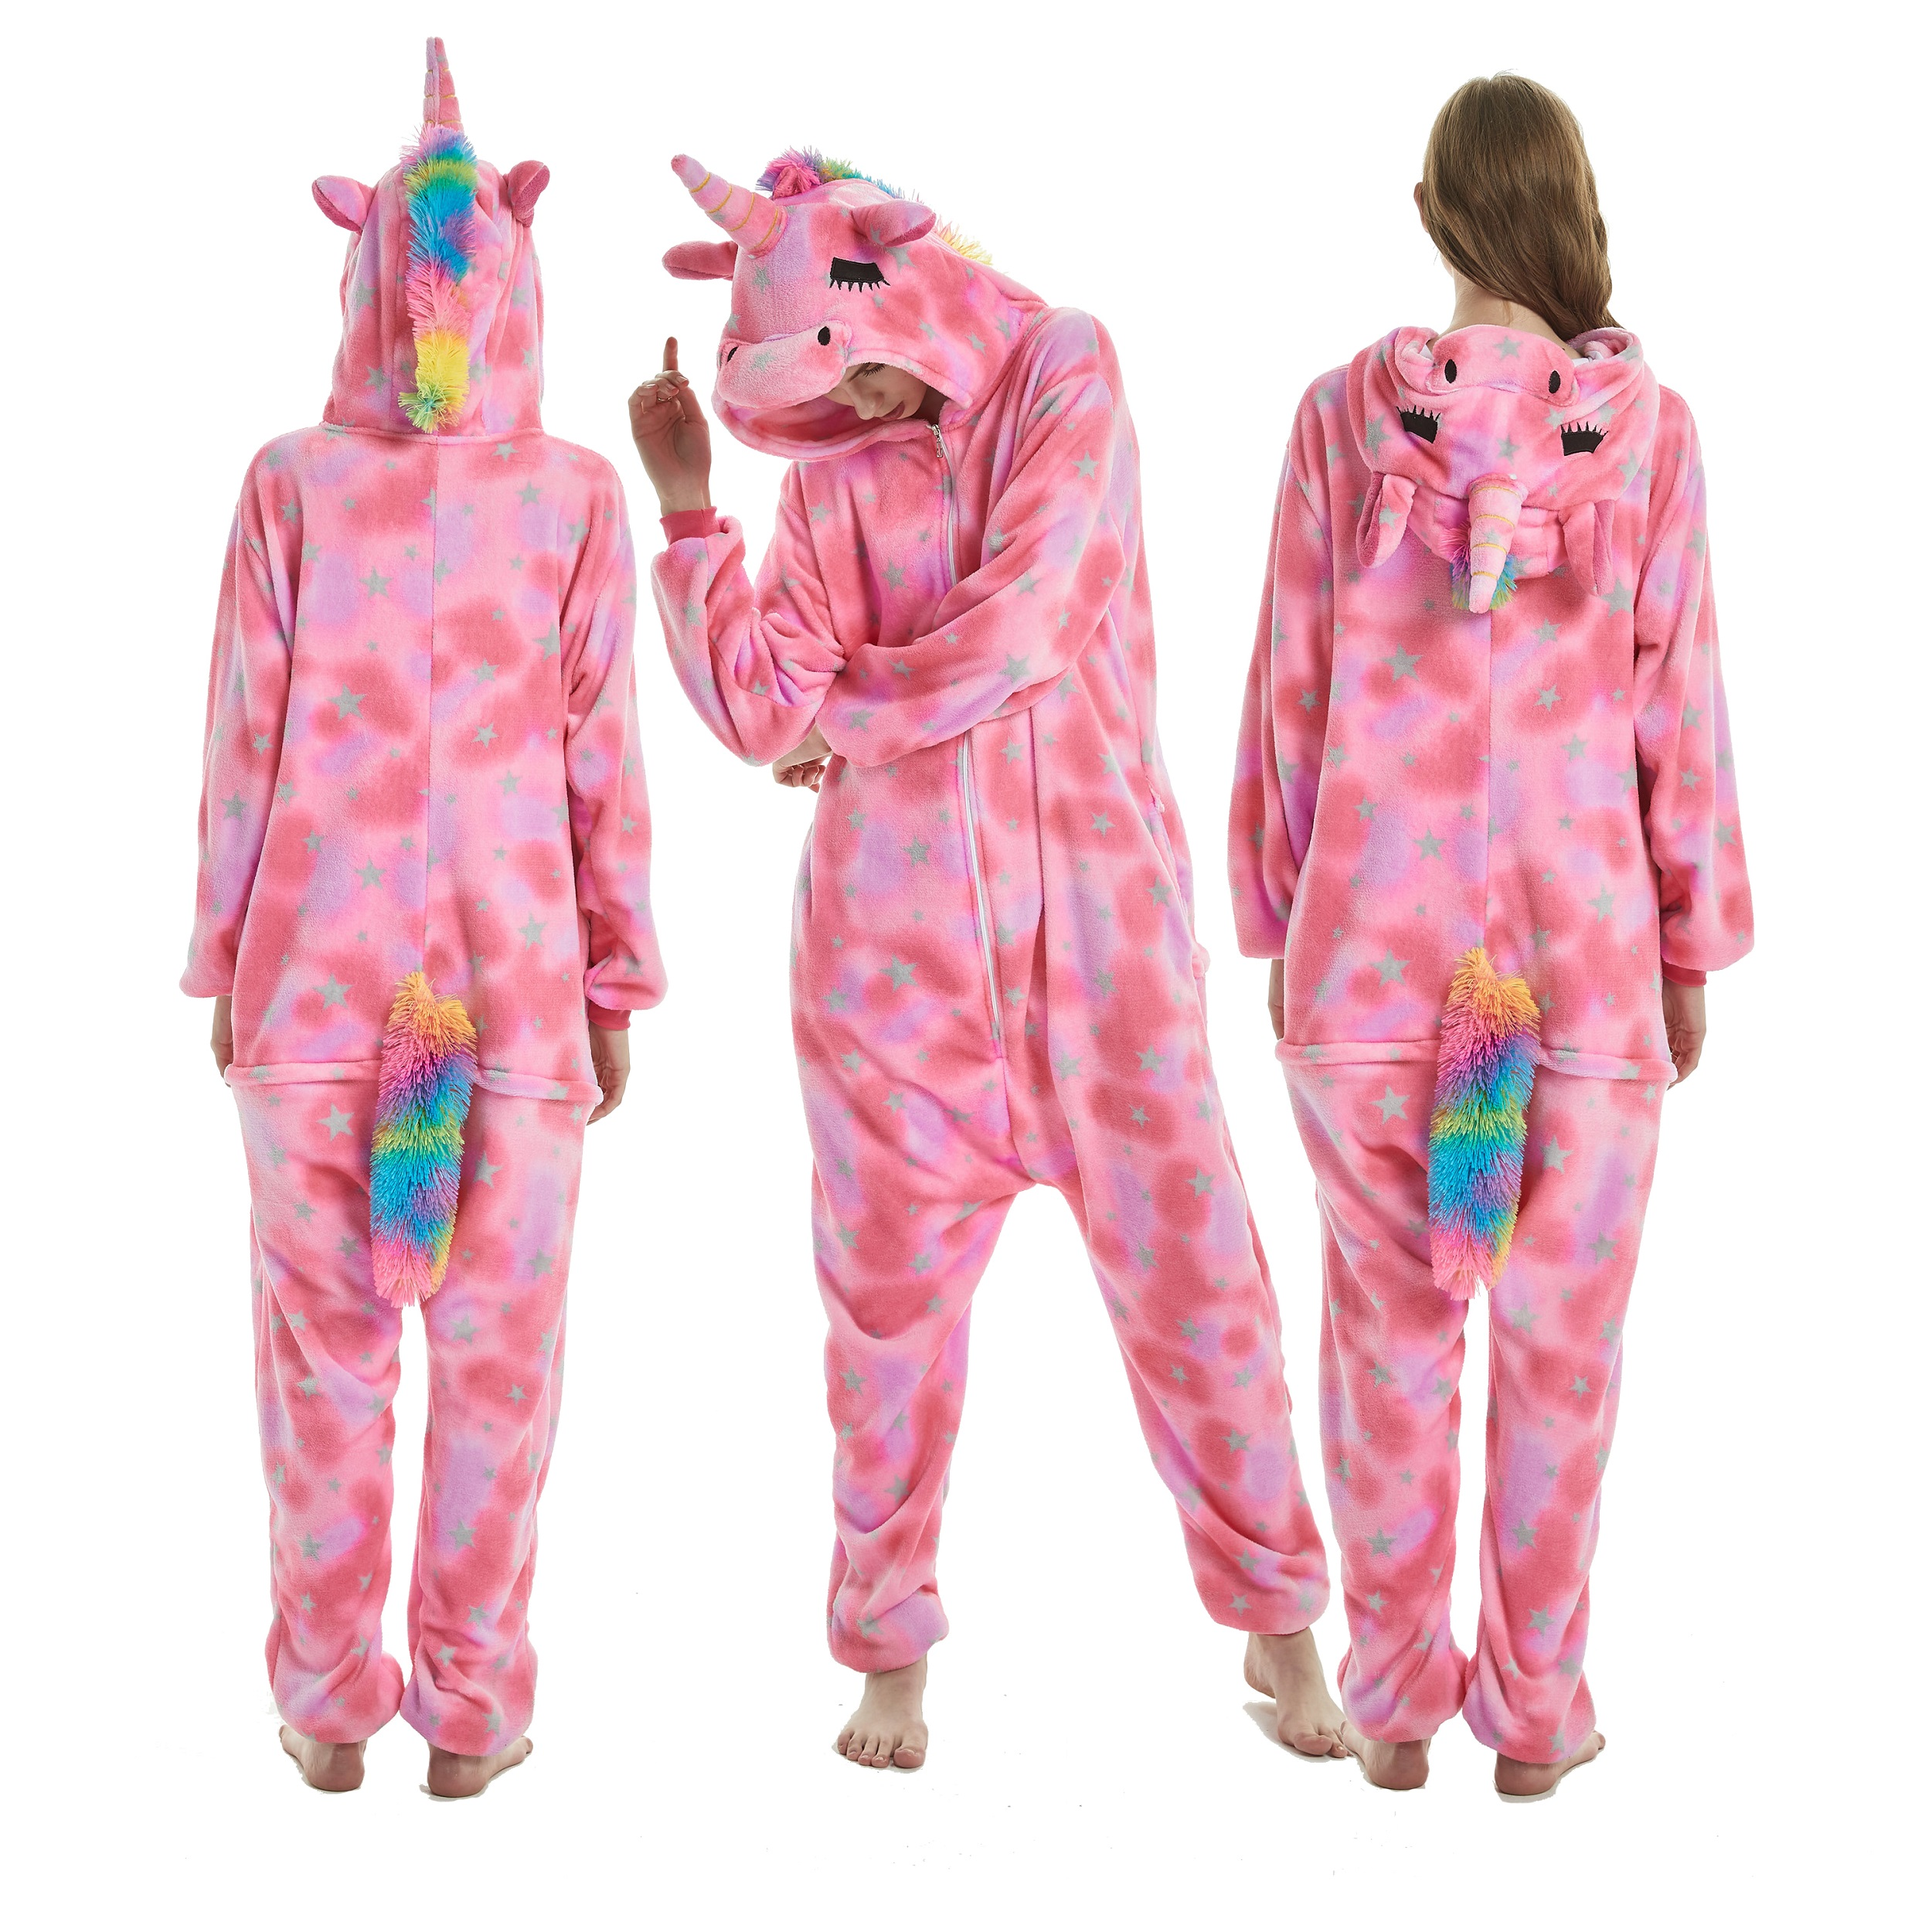 Christmas Onesie.Wholesale Super Soft Funny Animal Christmas Onesie Pajamas Flannel Kids Christmas Pajamas For Sale Buy Kids Animal Pajamas Adult Animal